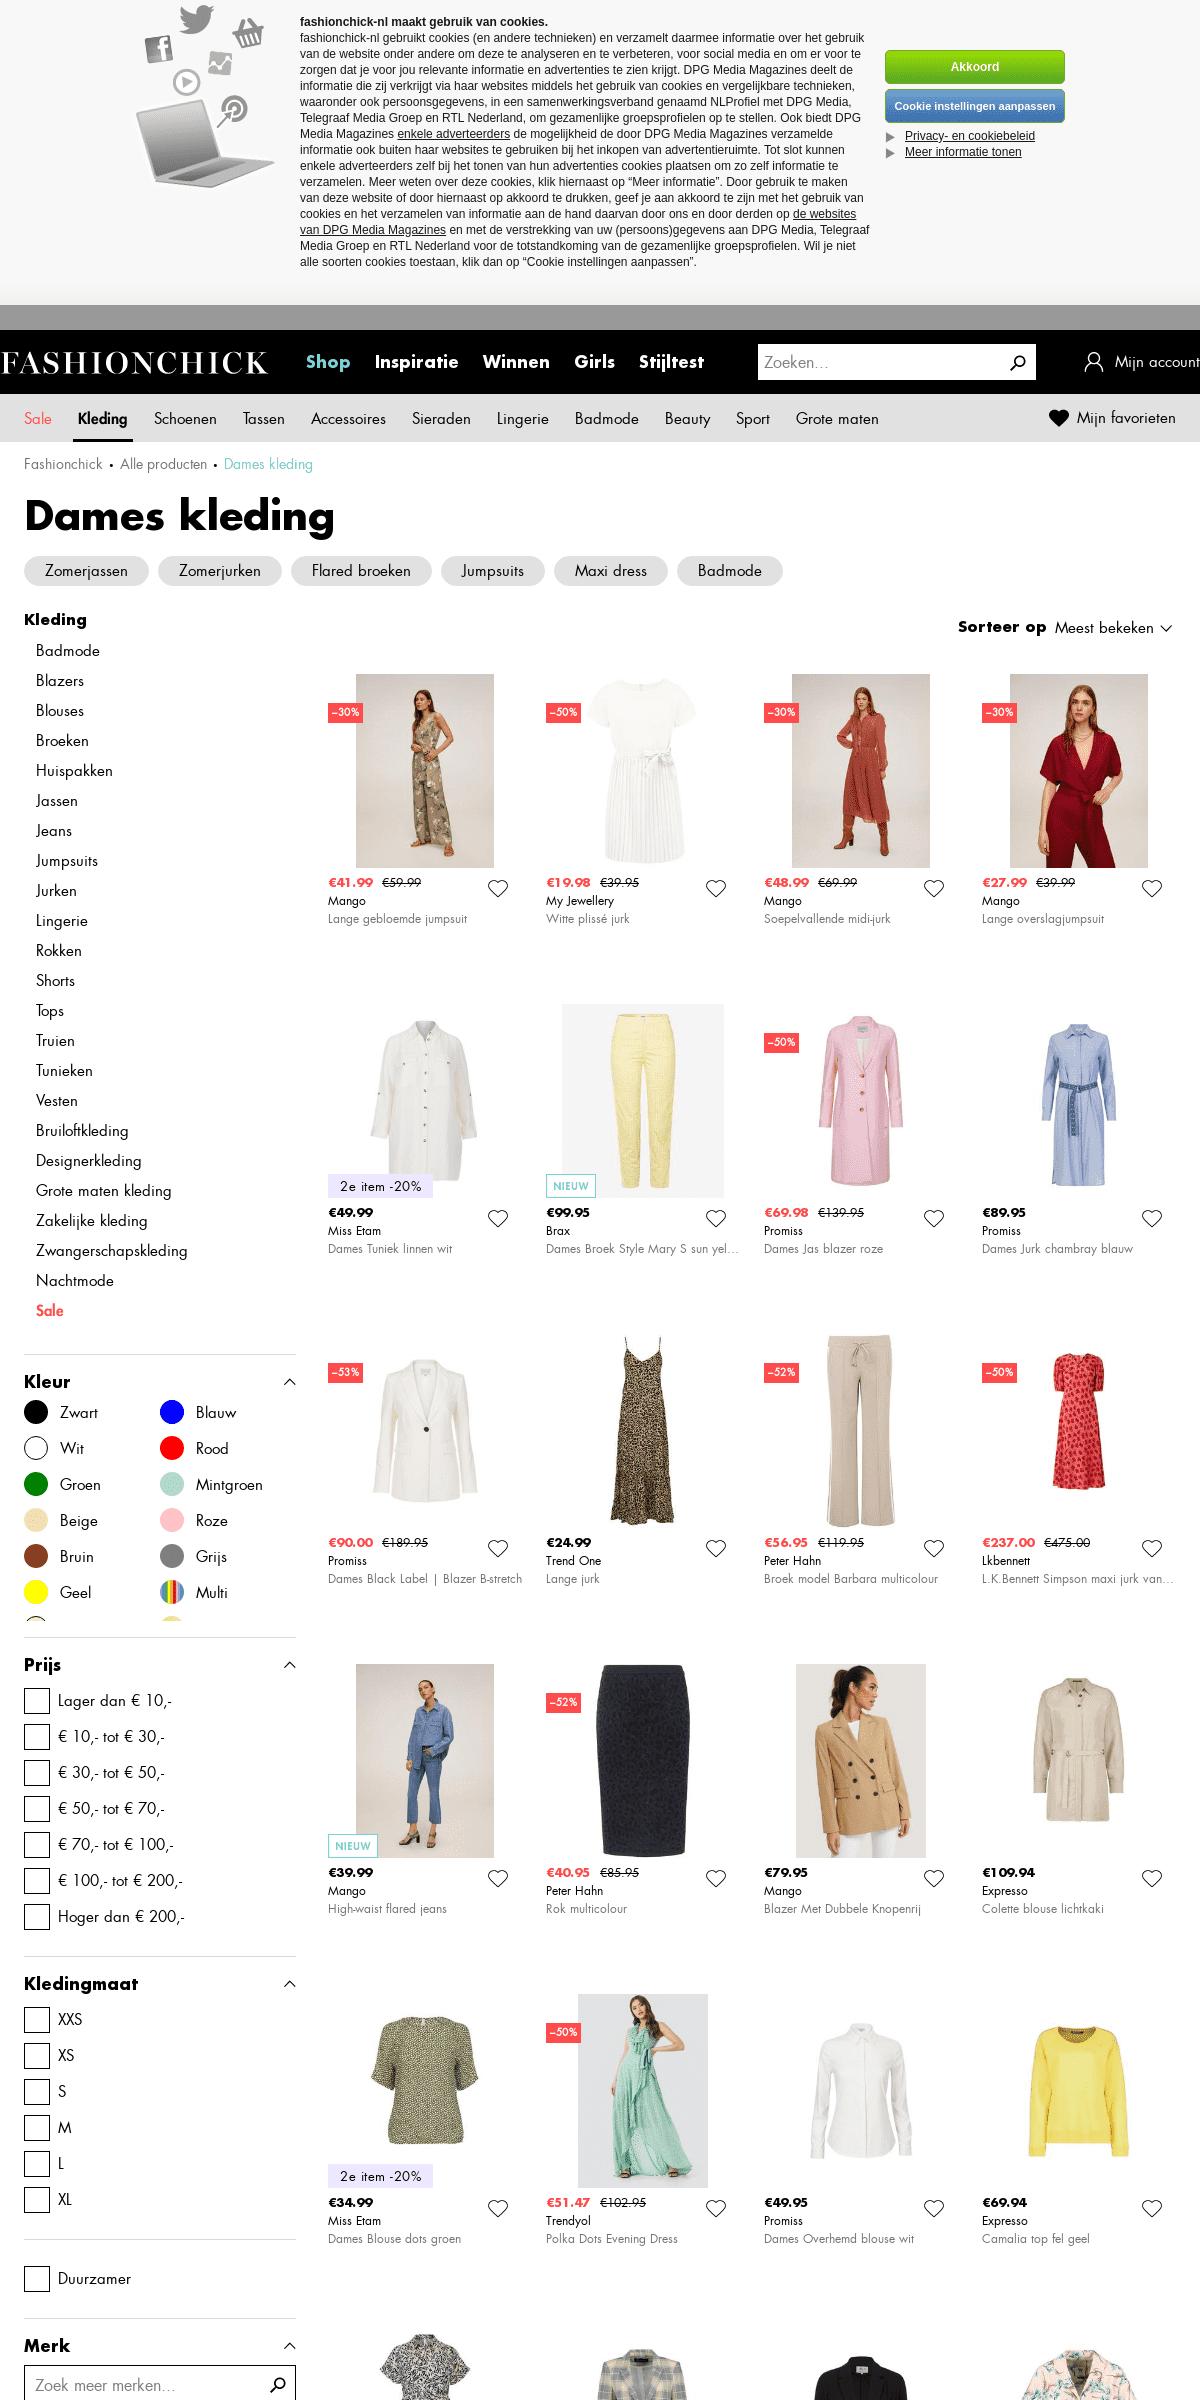 Dames kleding online kopen - Fashionchick.nl - Mode 2020